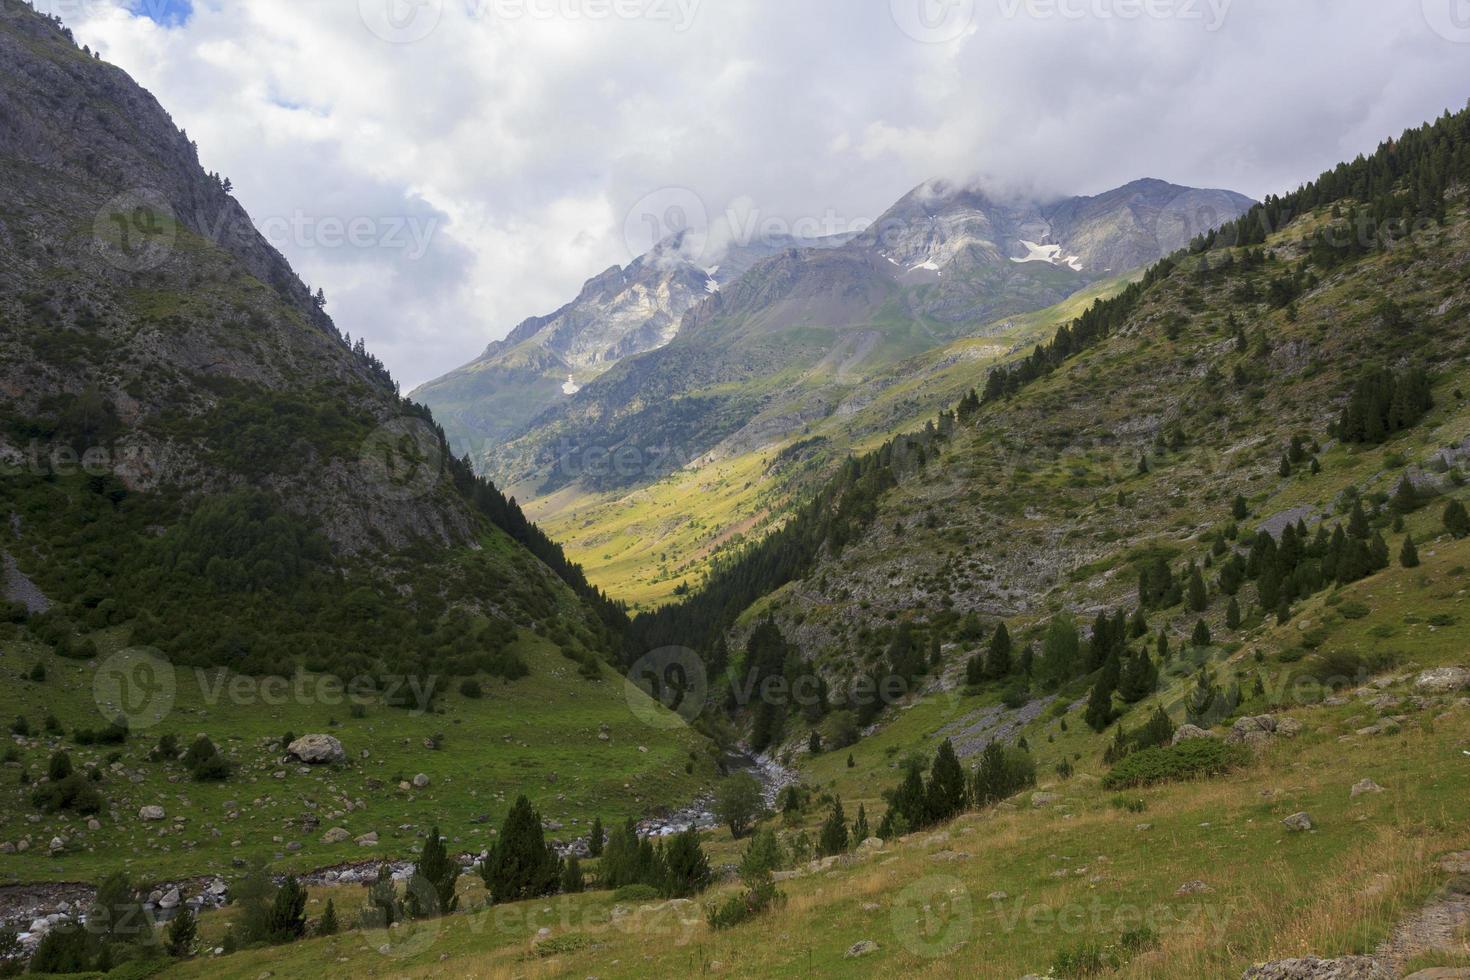 Bujaruelo valley, mountains of the Pyrenees photo